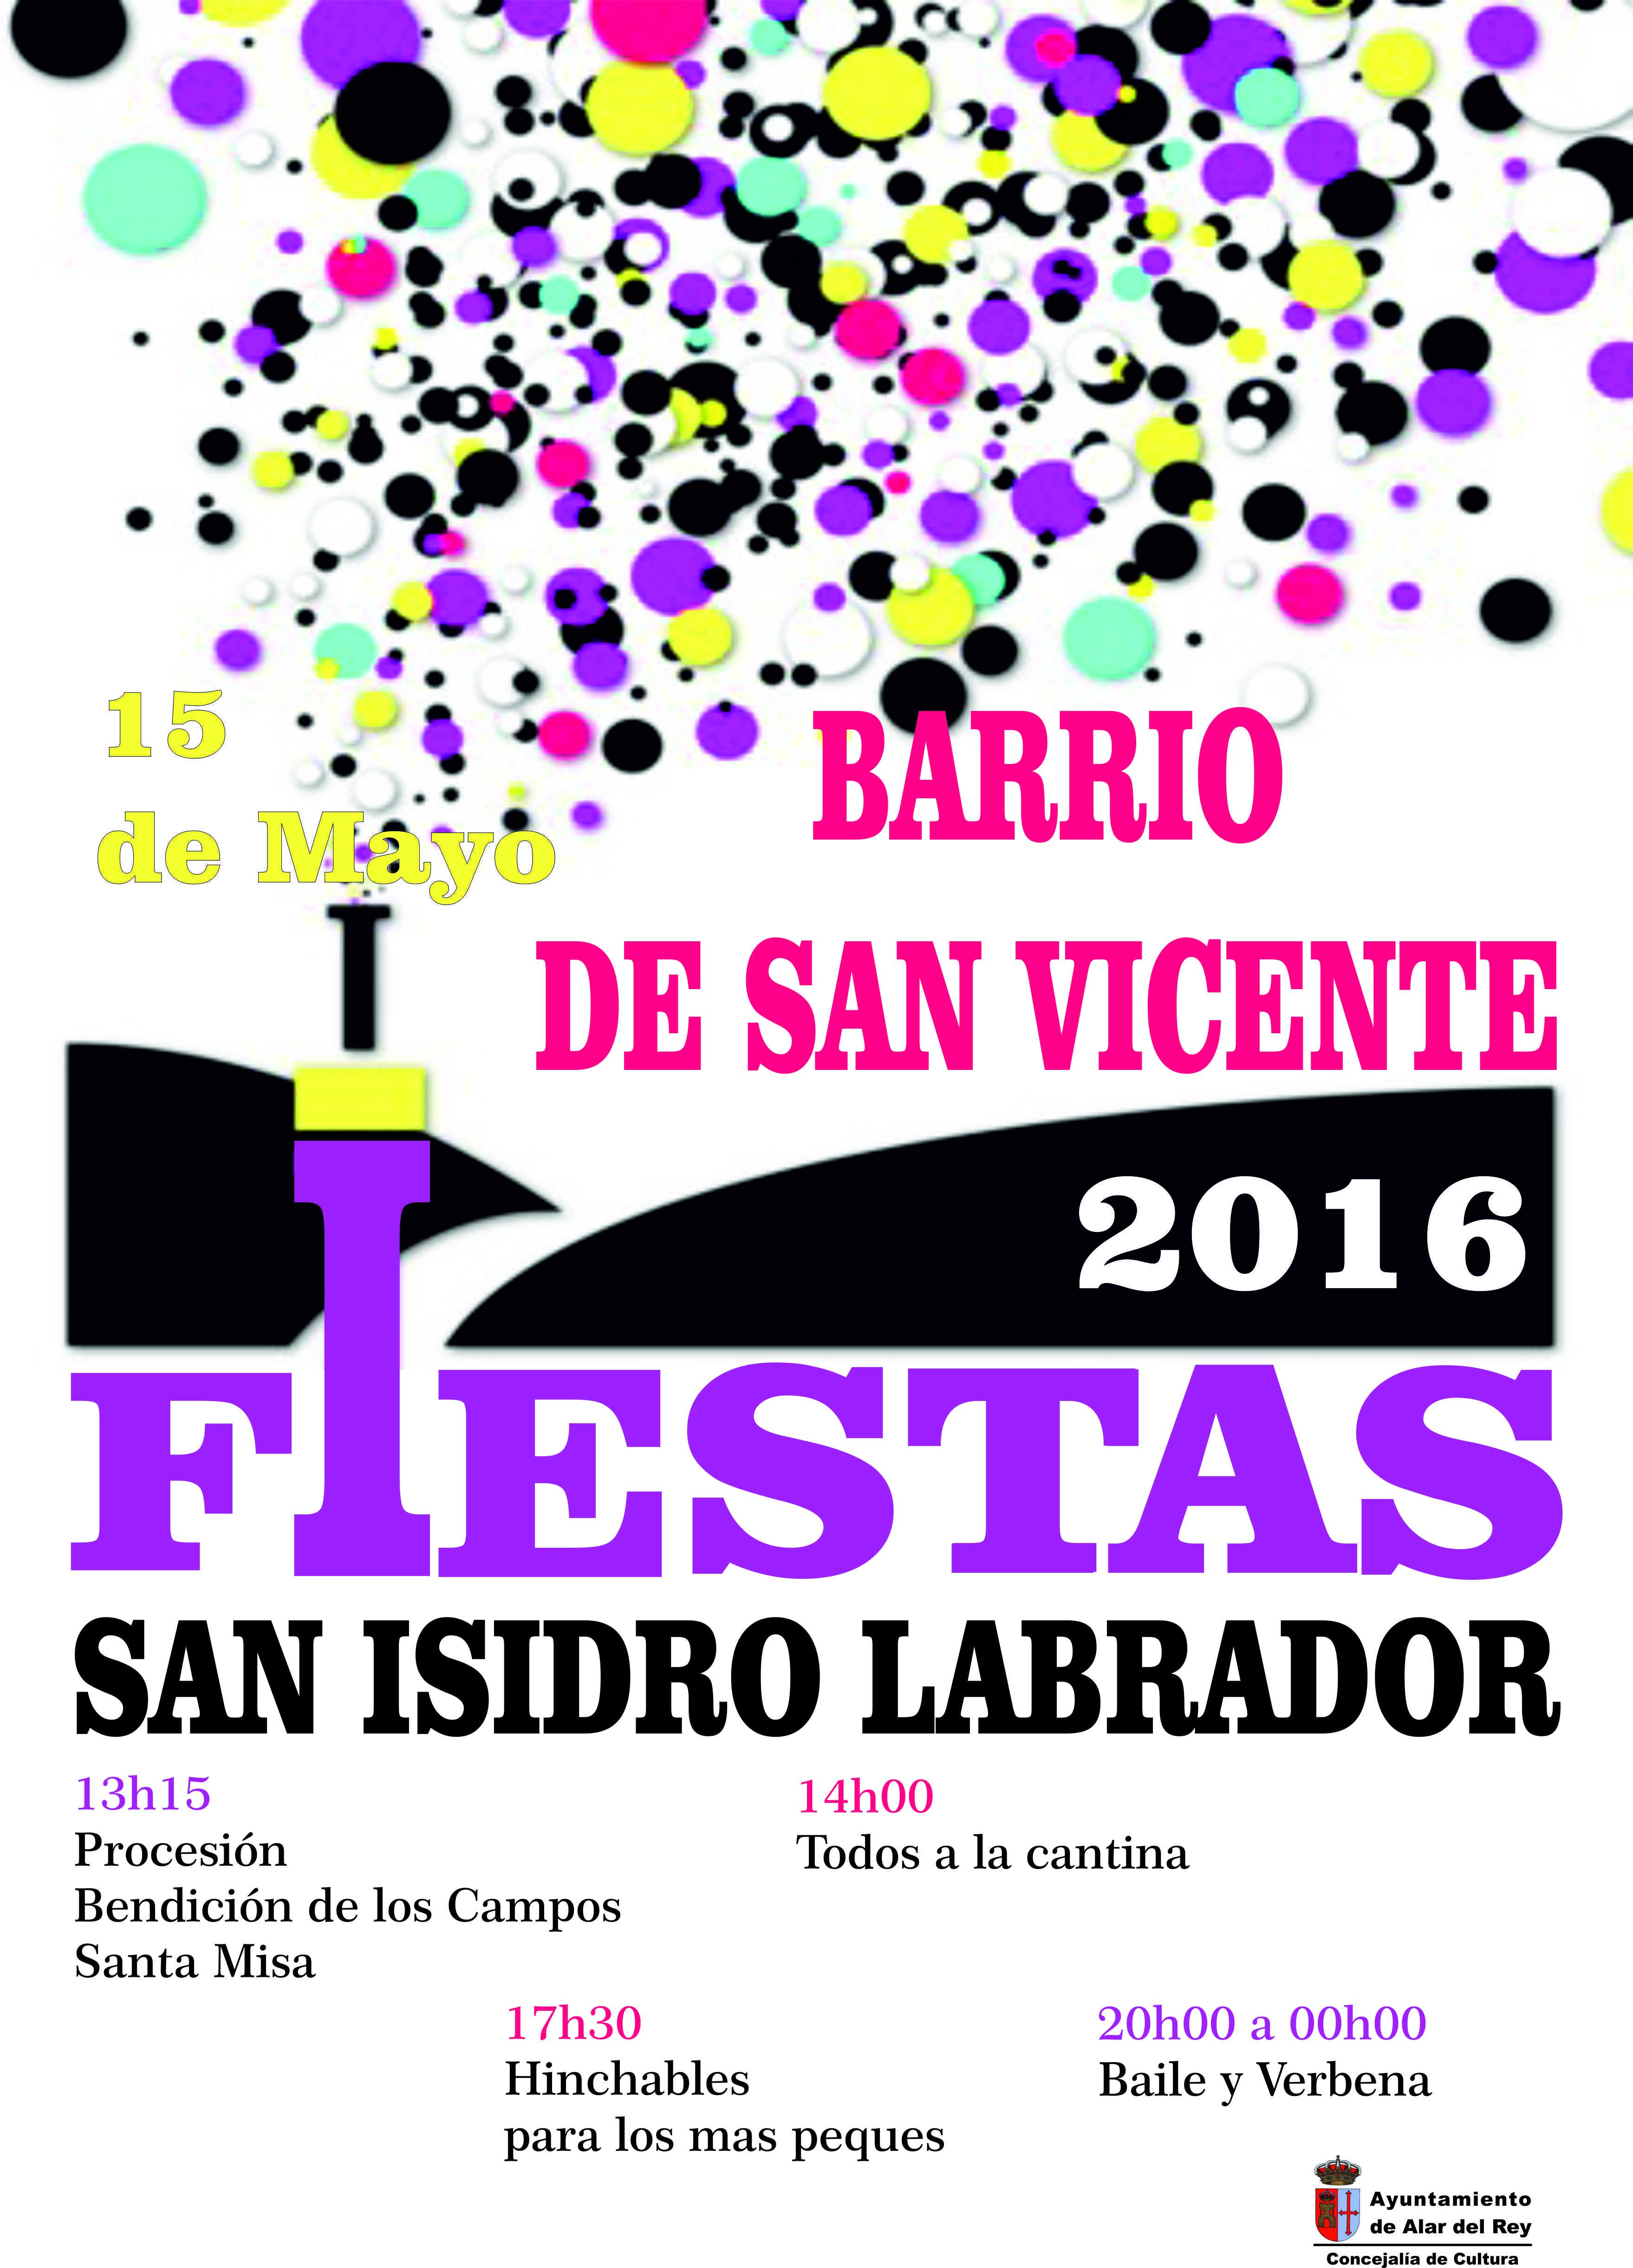 «FIESTAS SAN ISIDRO 2016»  BARRIO DE SAN VICENTE